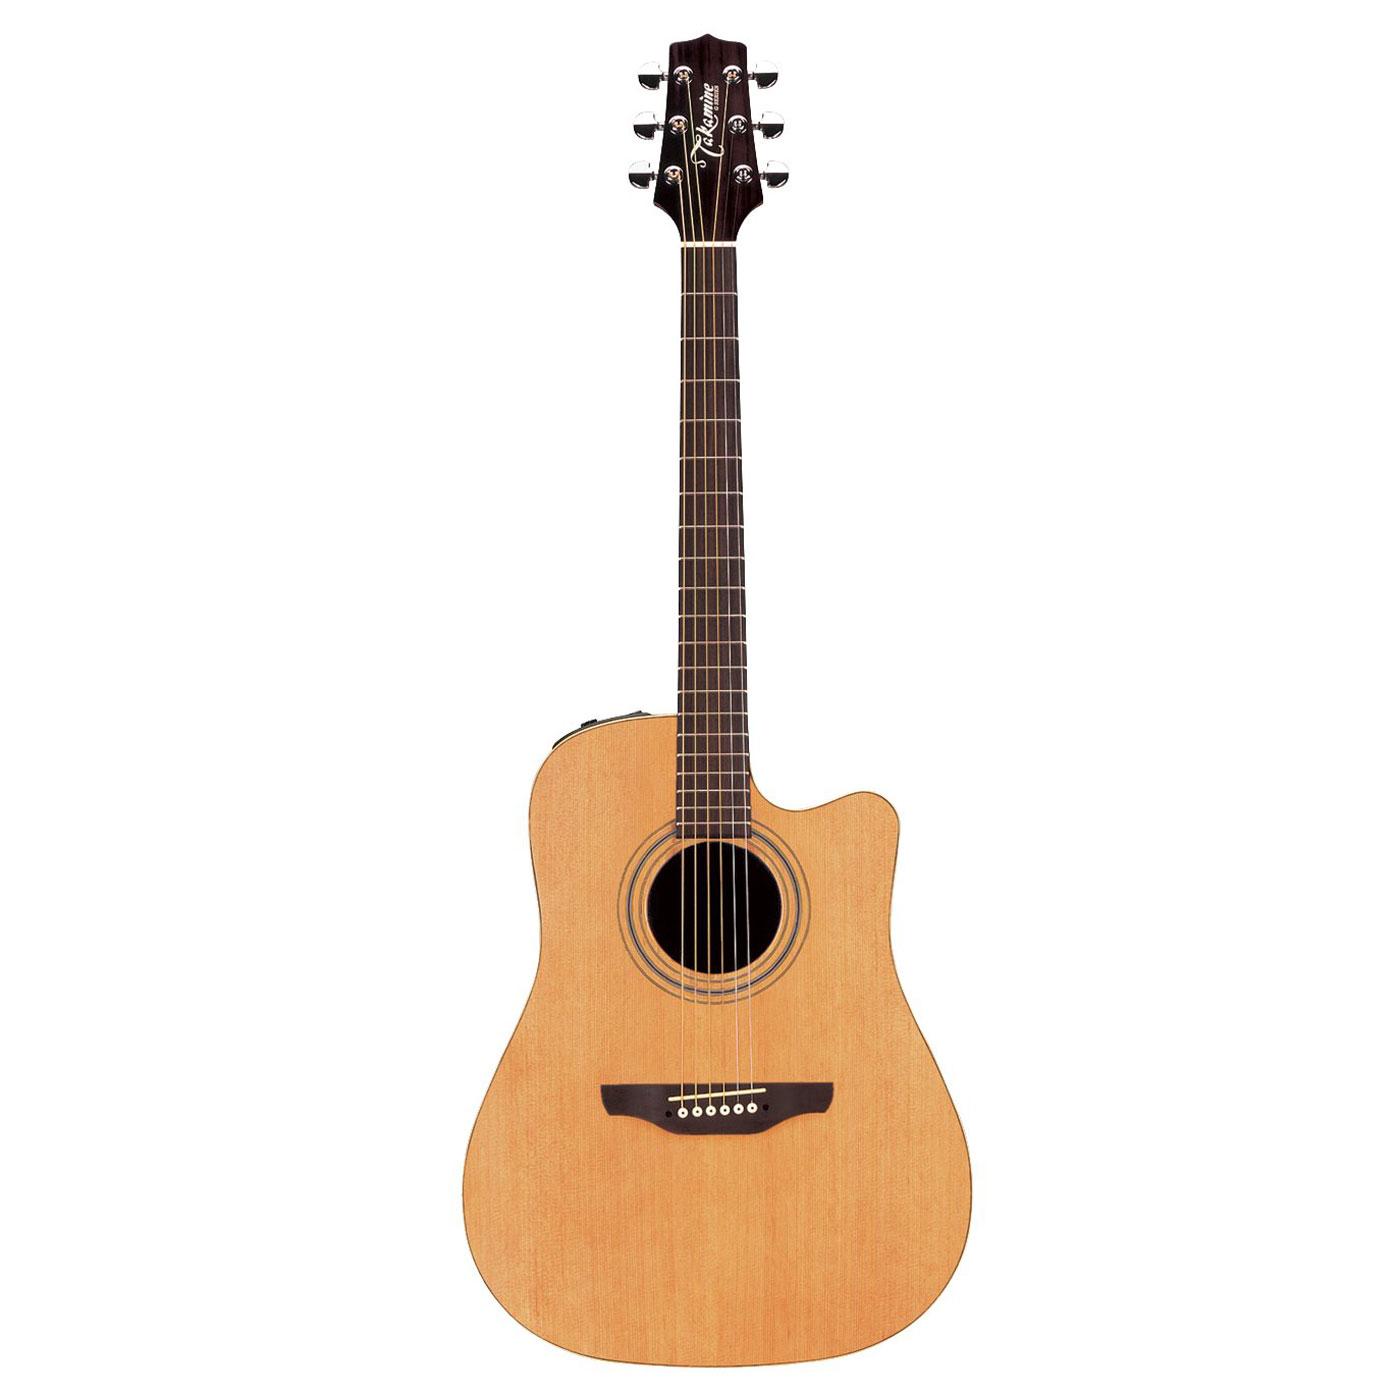 guitare folk takamine electro acoustique pan coup egs 330. Black Bedroom Furniture Sets. Home Design Ideas